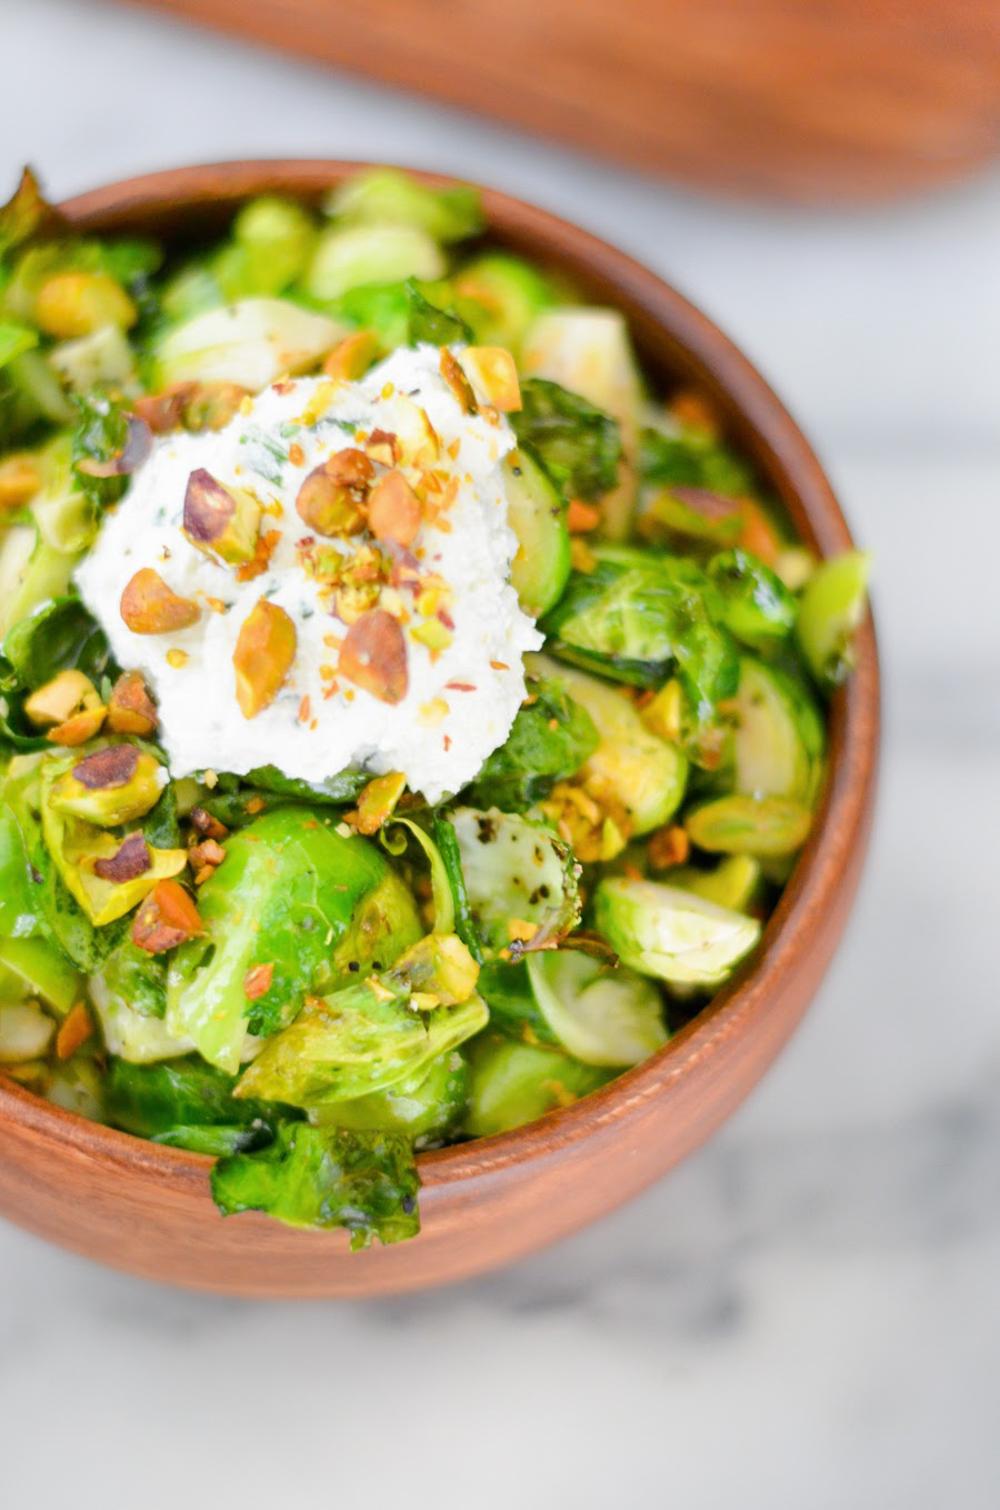 Easy healthy summer side dish recipes